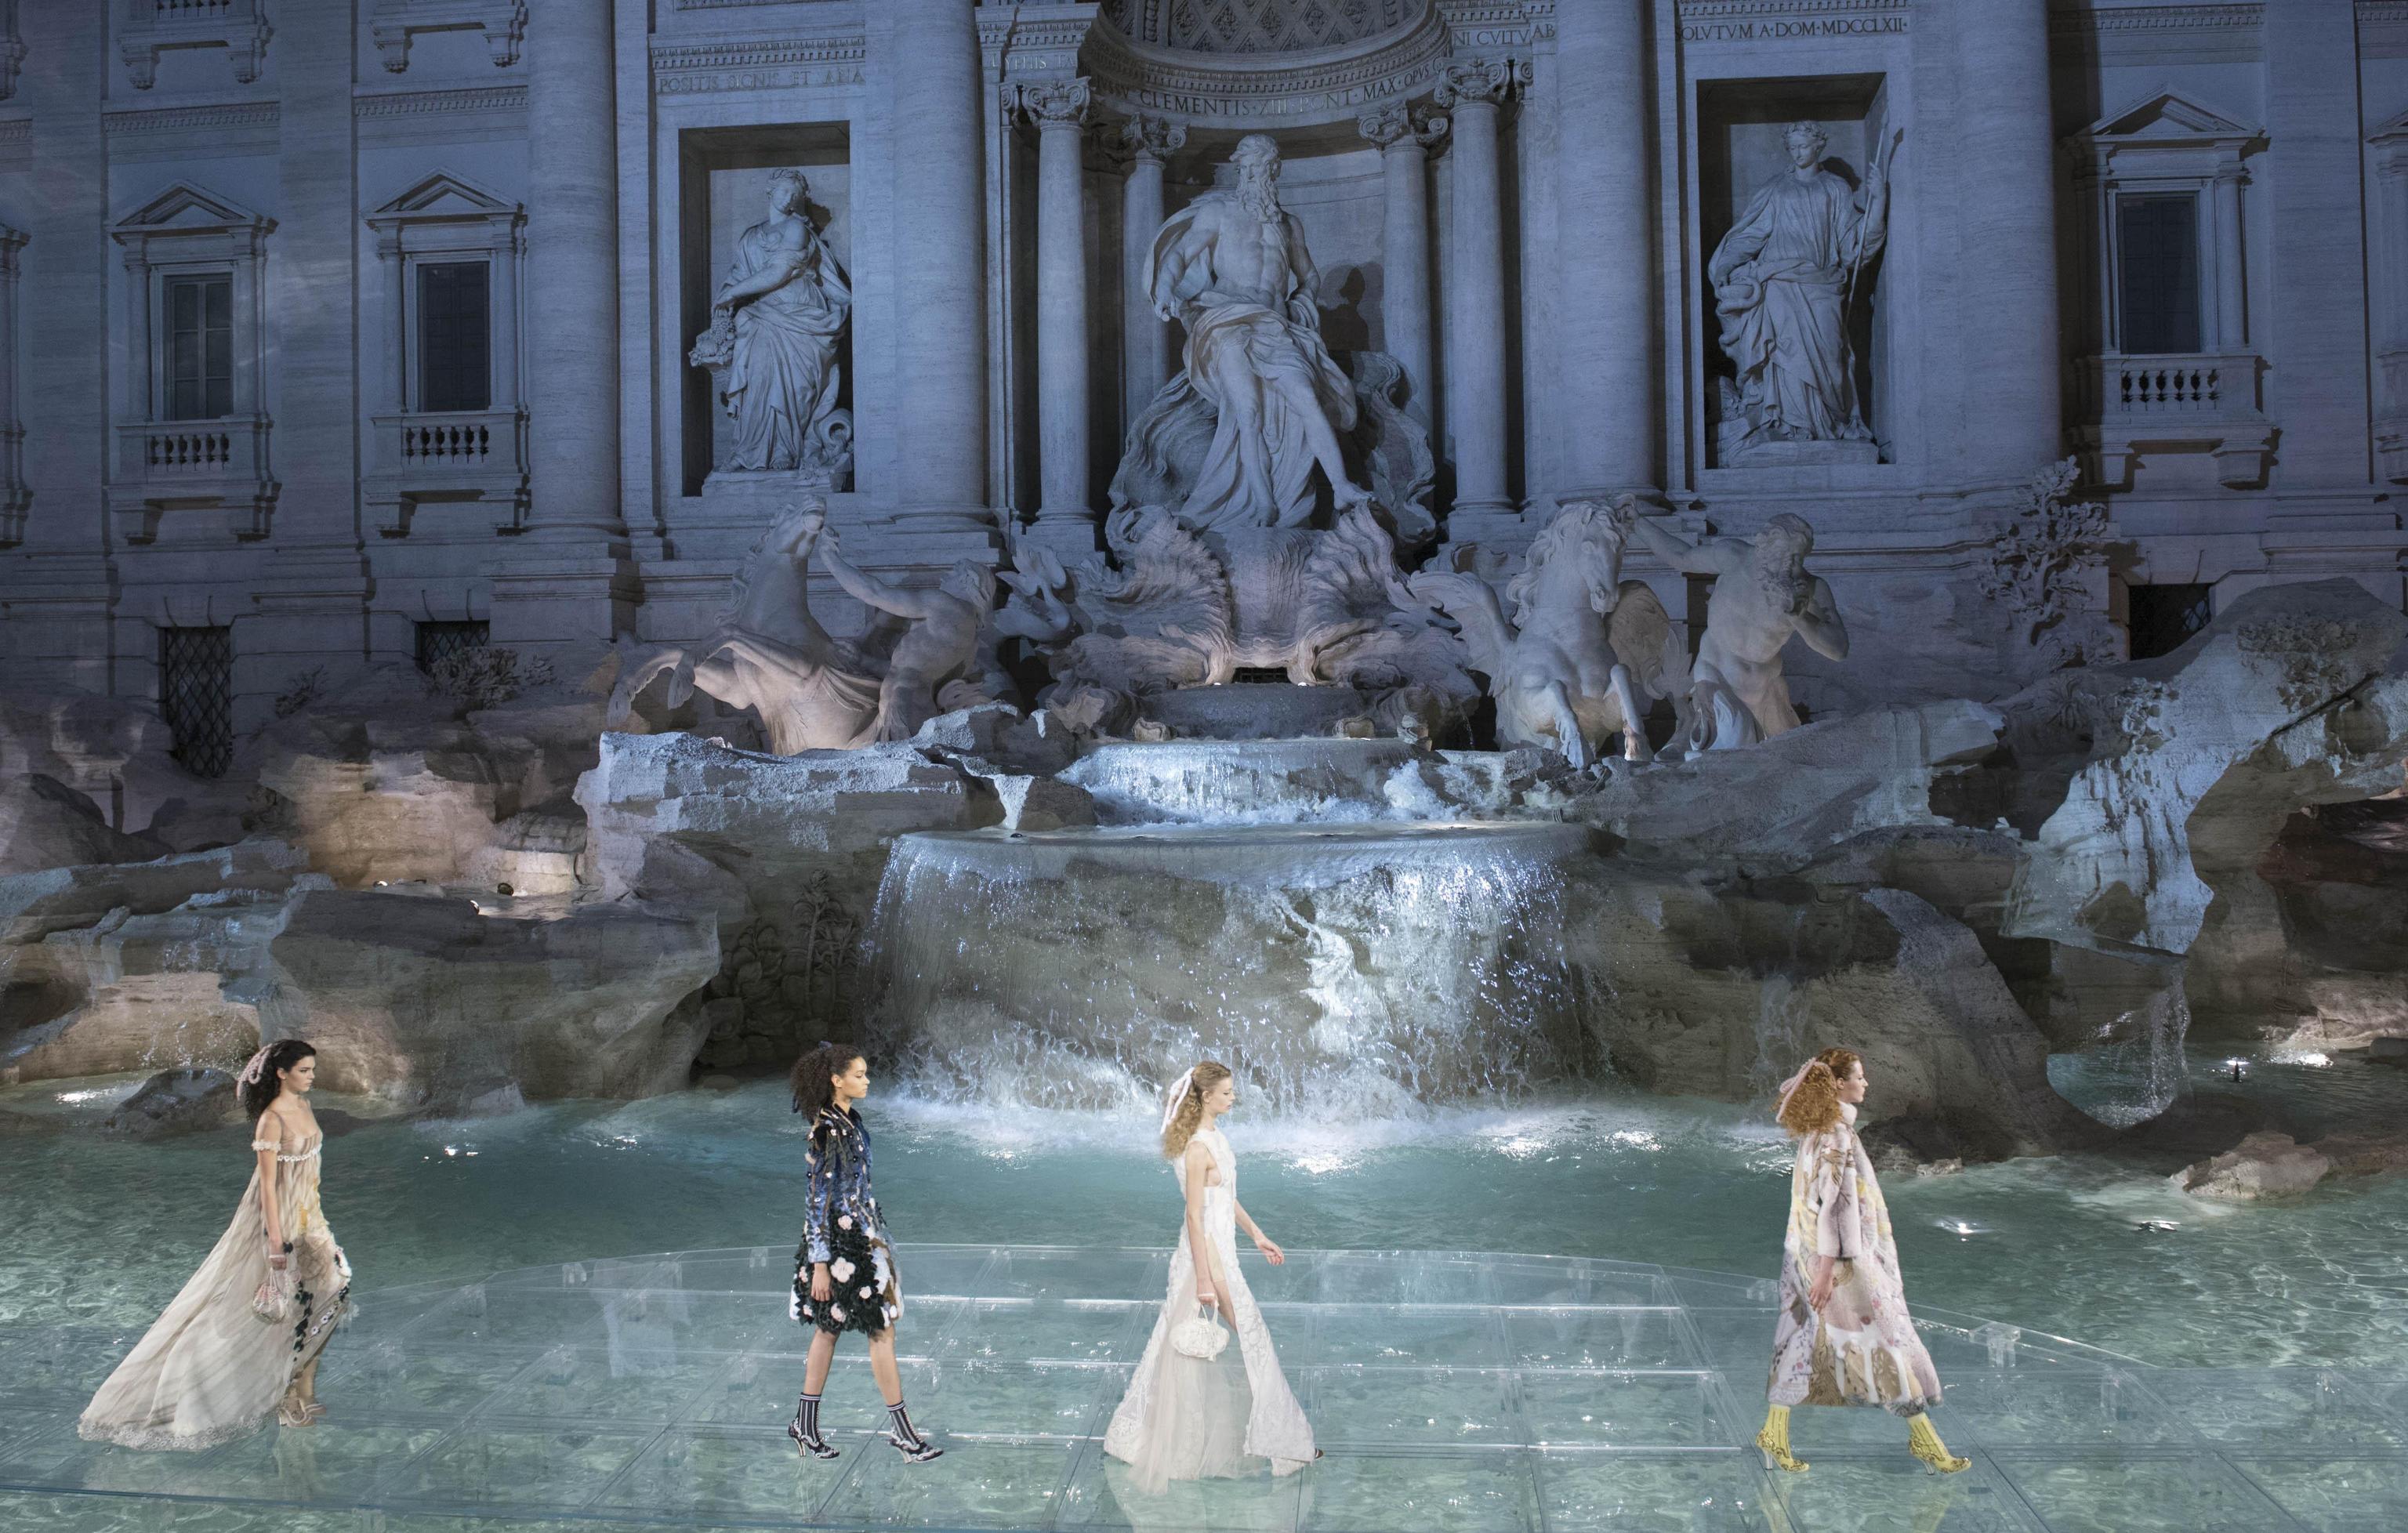 Fendi's spectacular runway show in Fontaine de Trevi